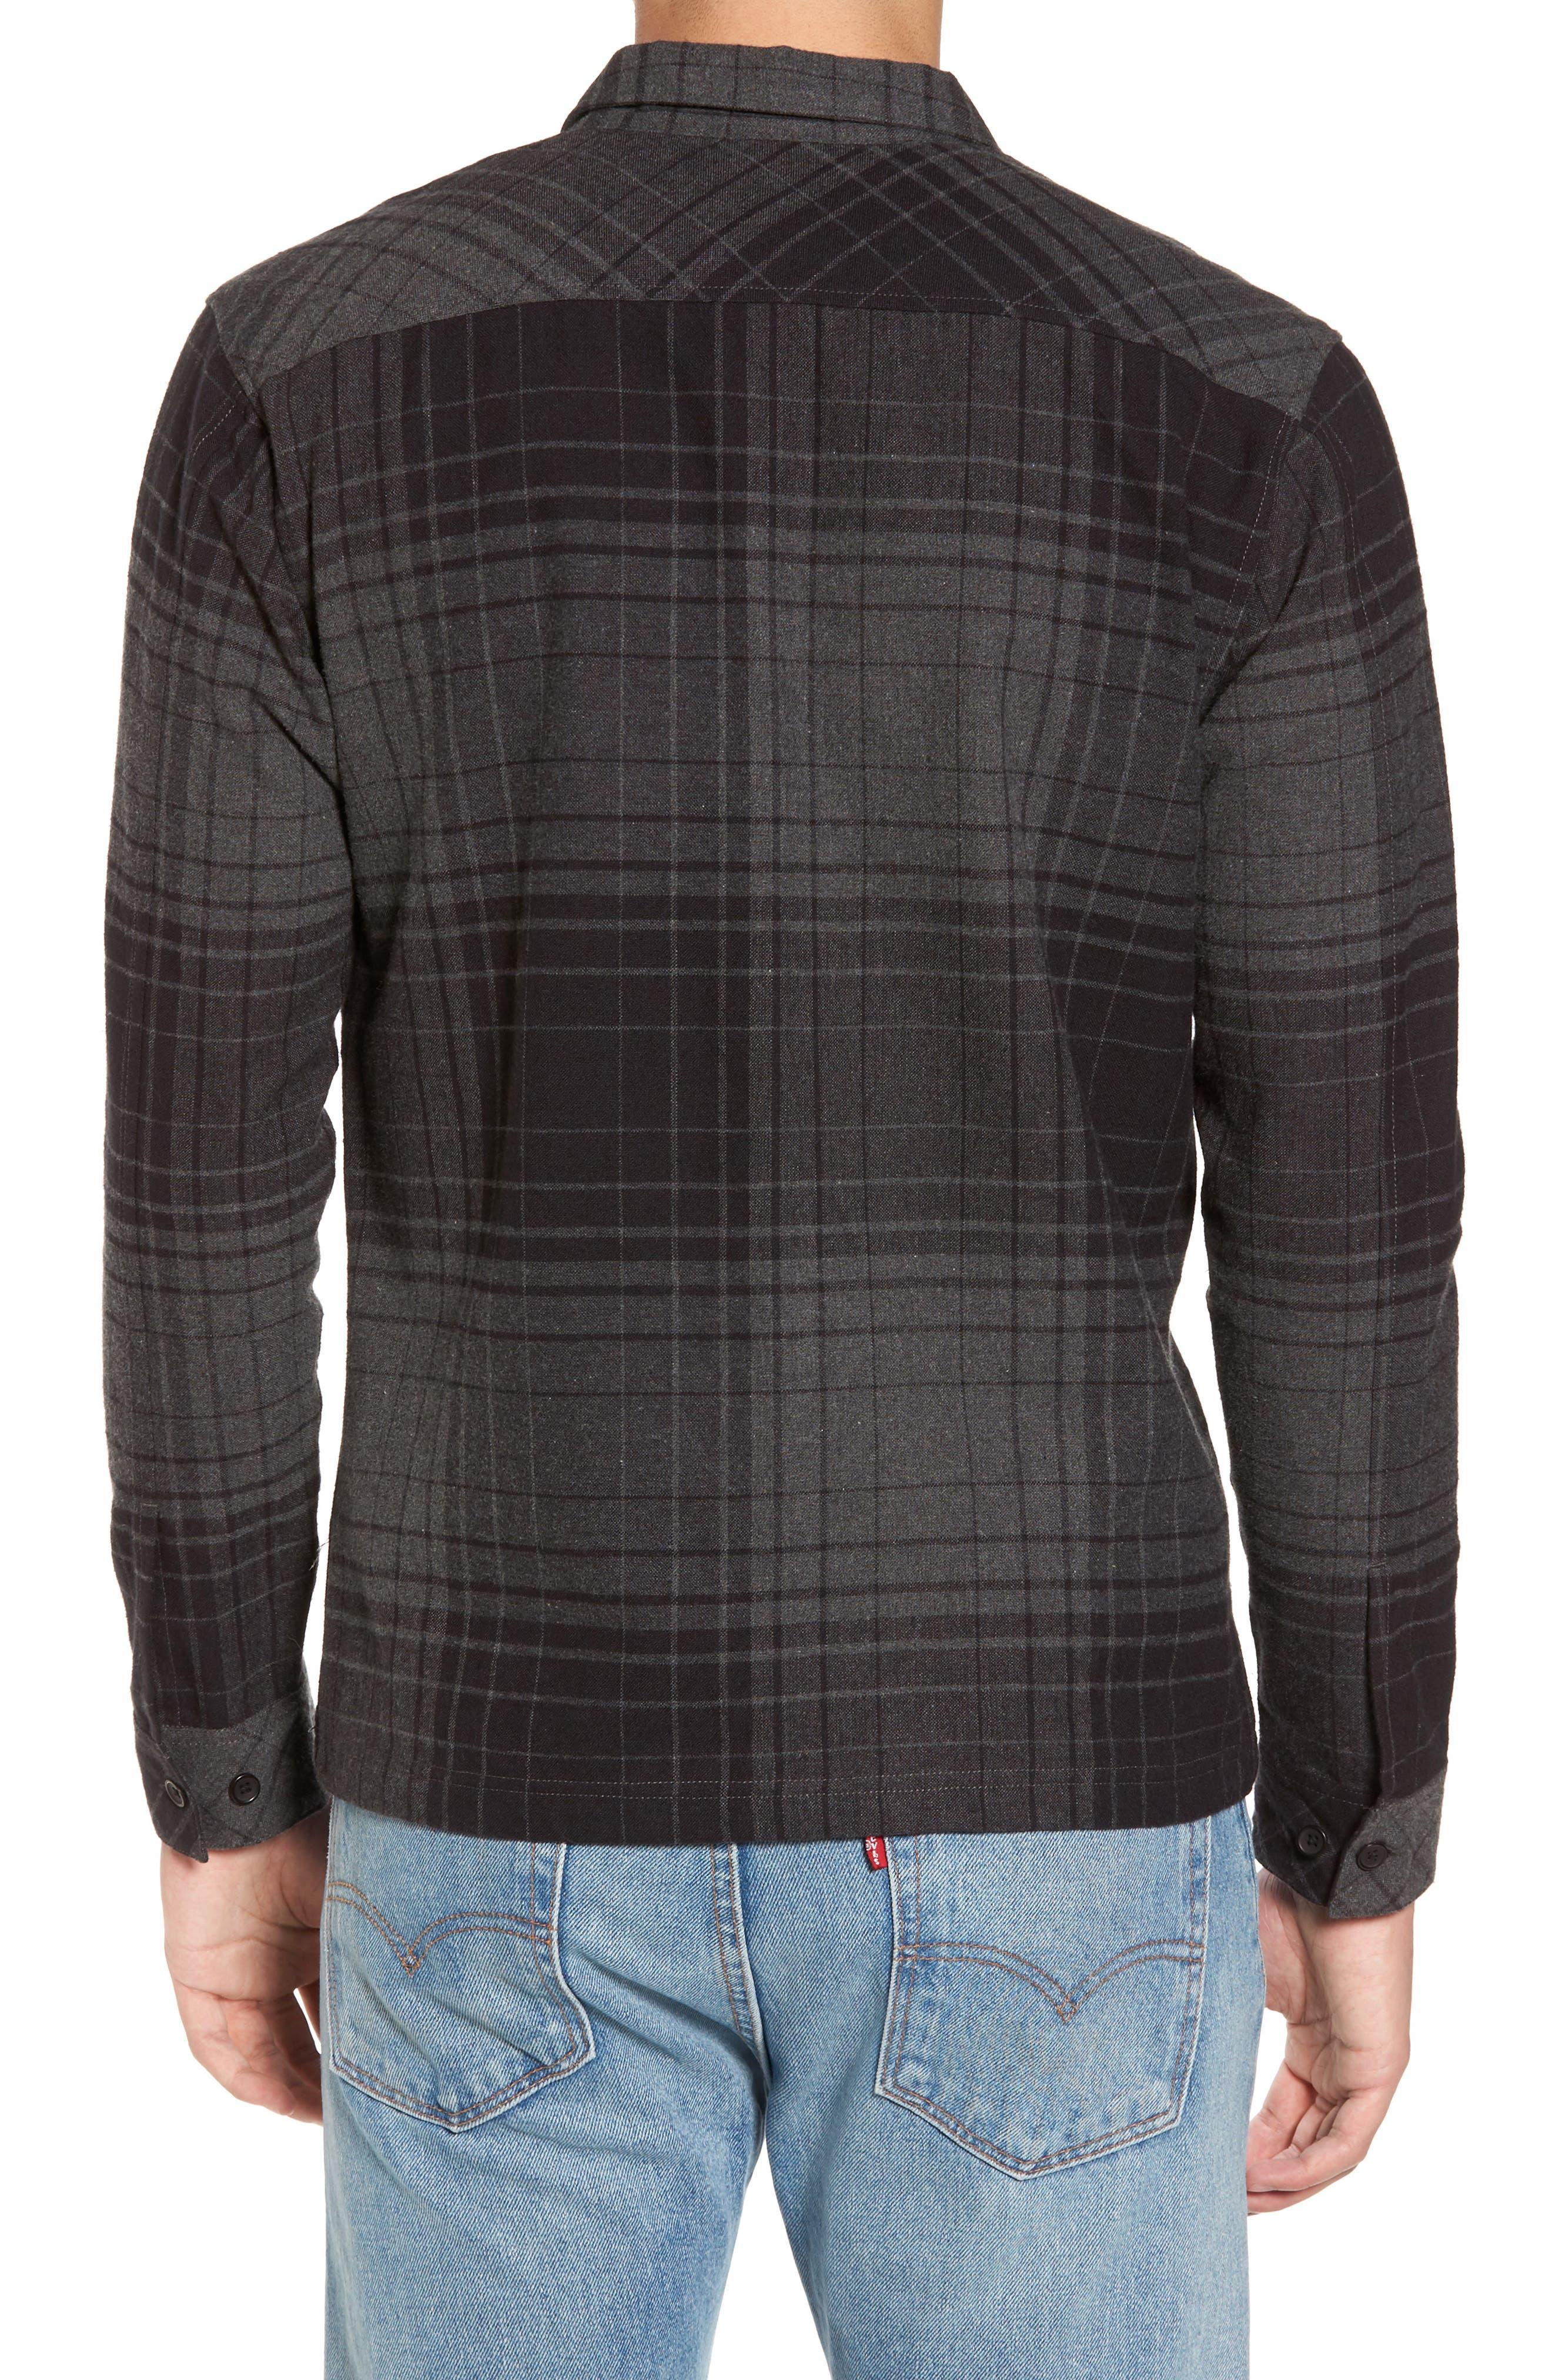 Lamar Shirt Jacket,                             Alternate thumbnail 2, color,                             001